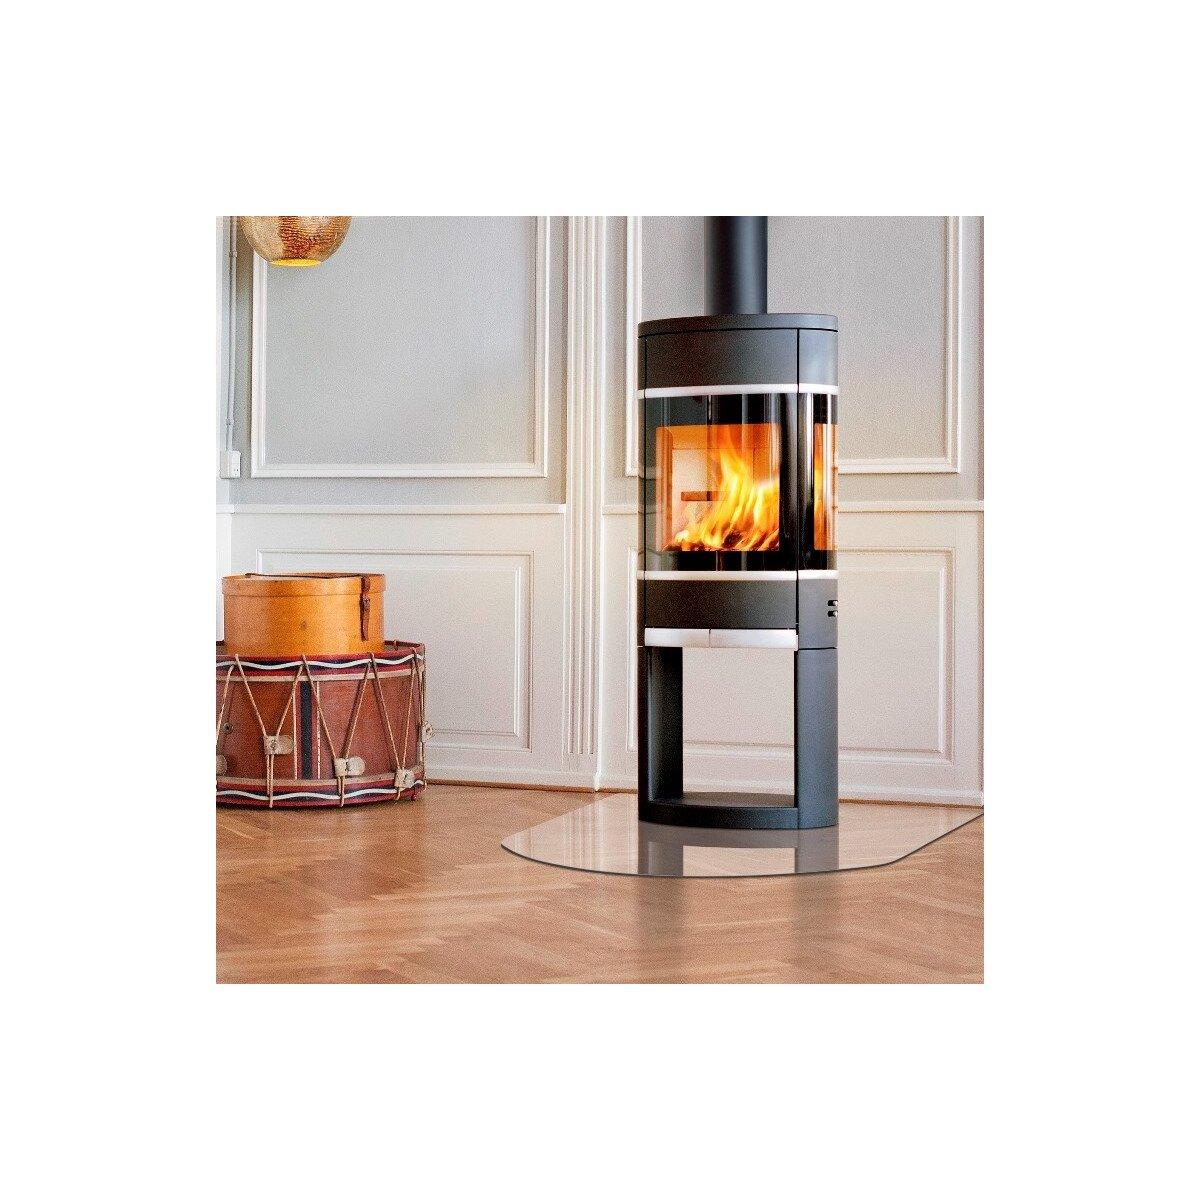 kaminofen scan 68 12 offener sockel online kaufen. Black Bedroom Furniture Sets. Home Design Ideas